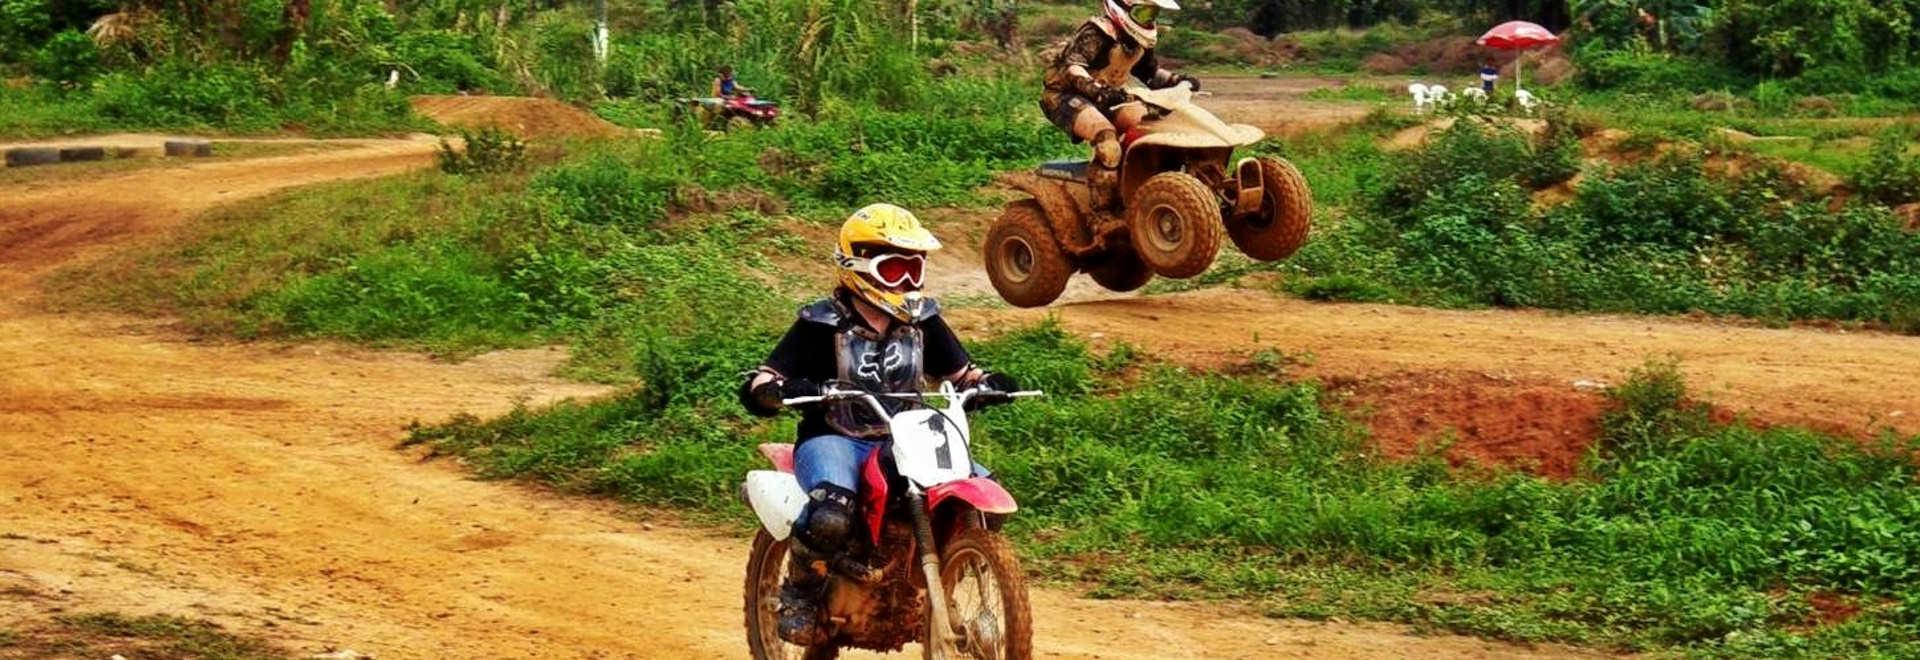 11-must-experience-adventures-in-bangalore.jpg